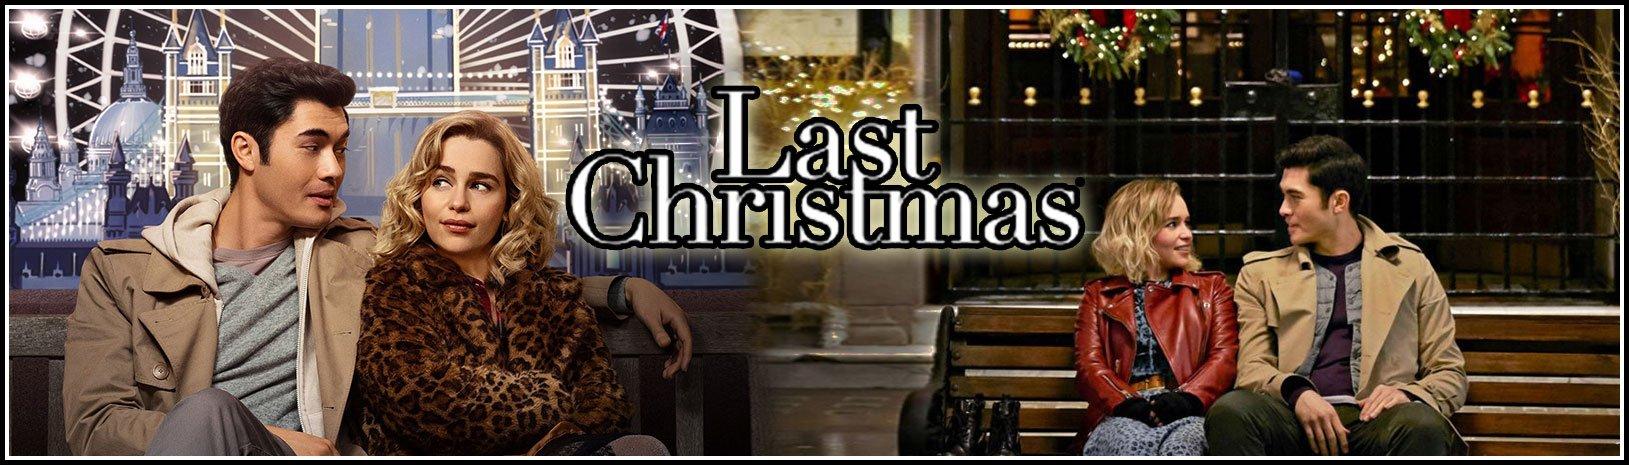 last christmas merchandise